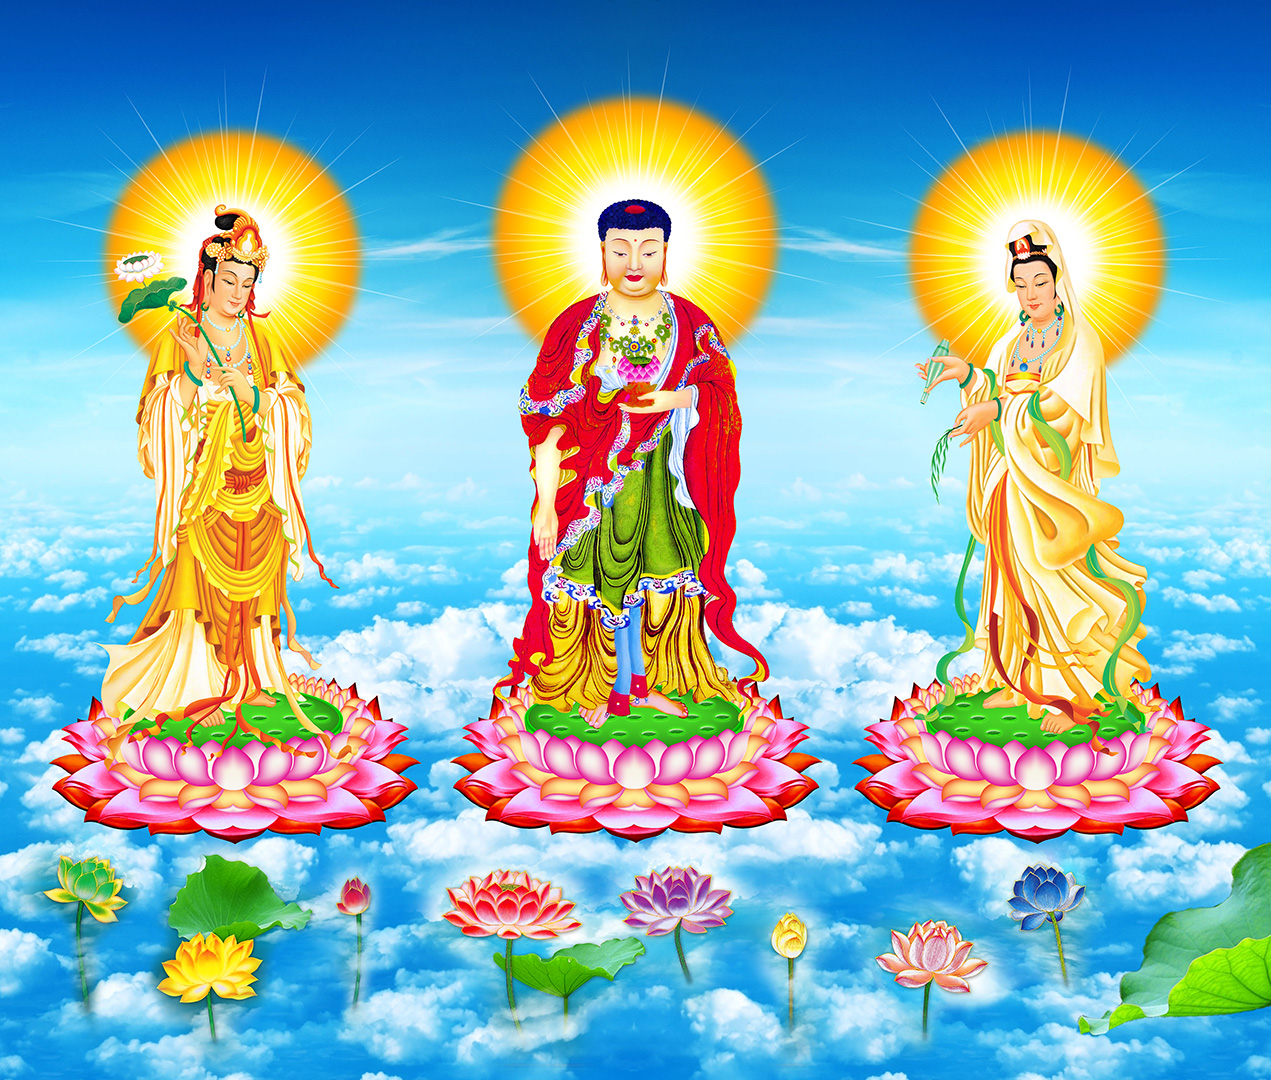 Tay-Phuong-Tam-Thanh-01